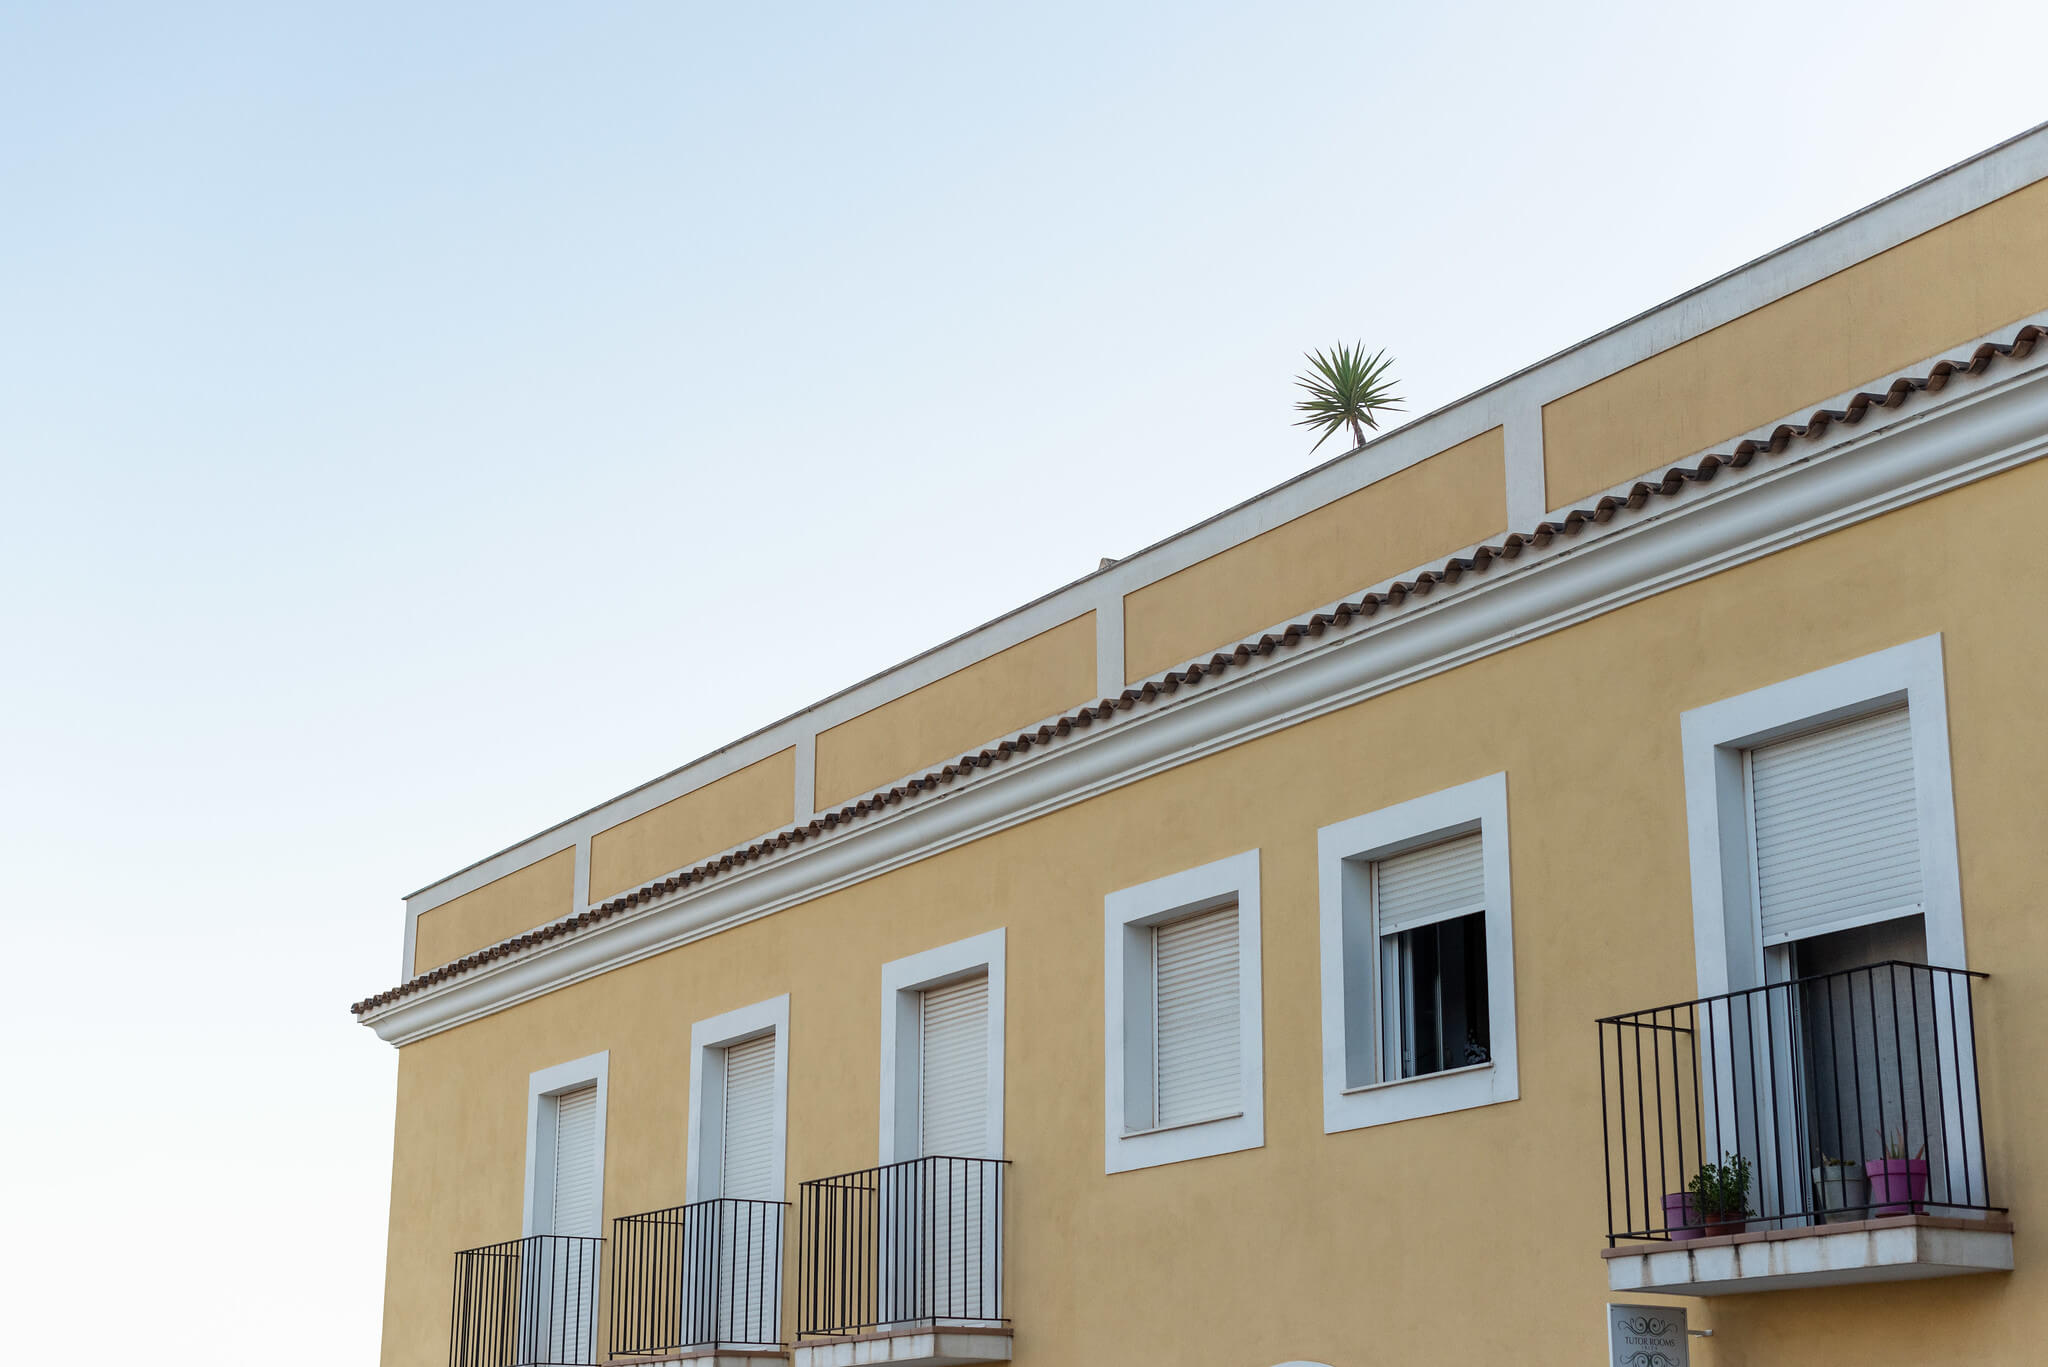 https://www.white-ibiza.com/wp-content/uploads/2020/05/white-ibiza-villas-where-to-stay-santa-gertrudis-06.jpg